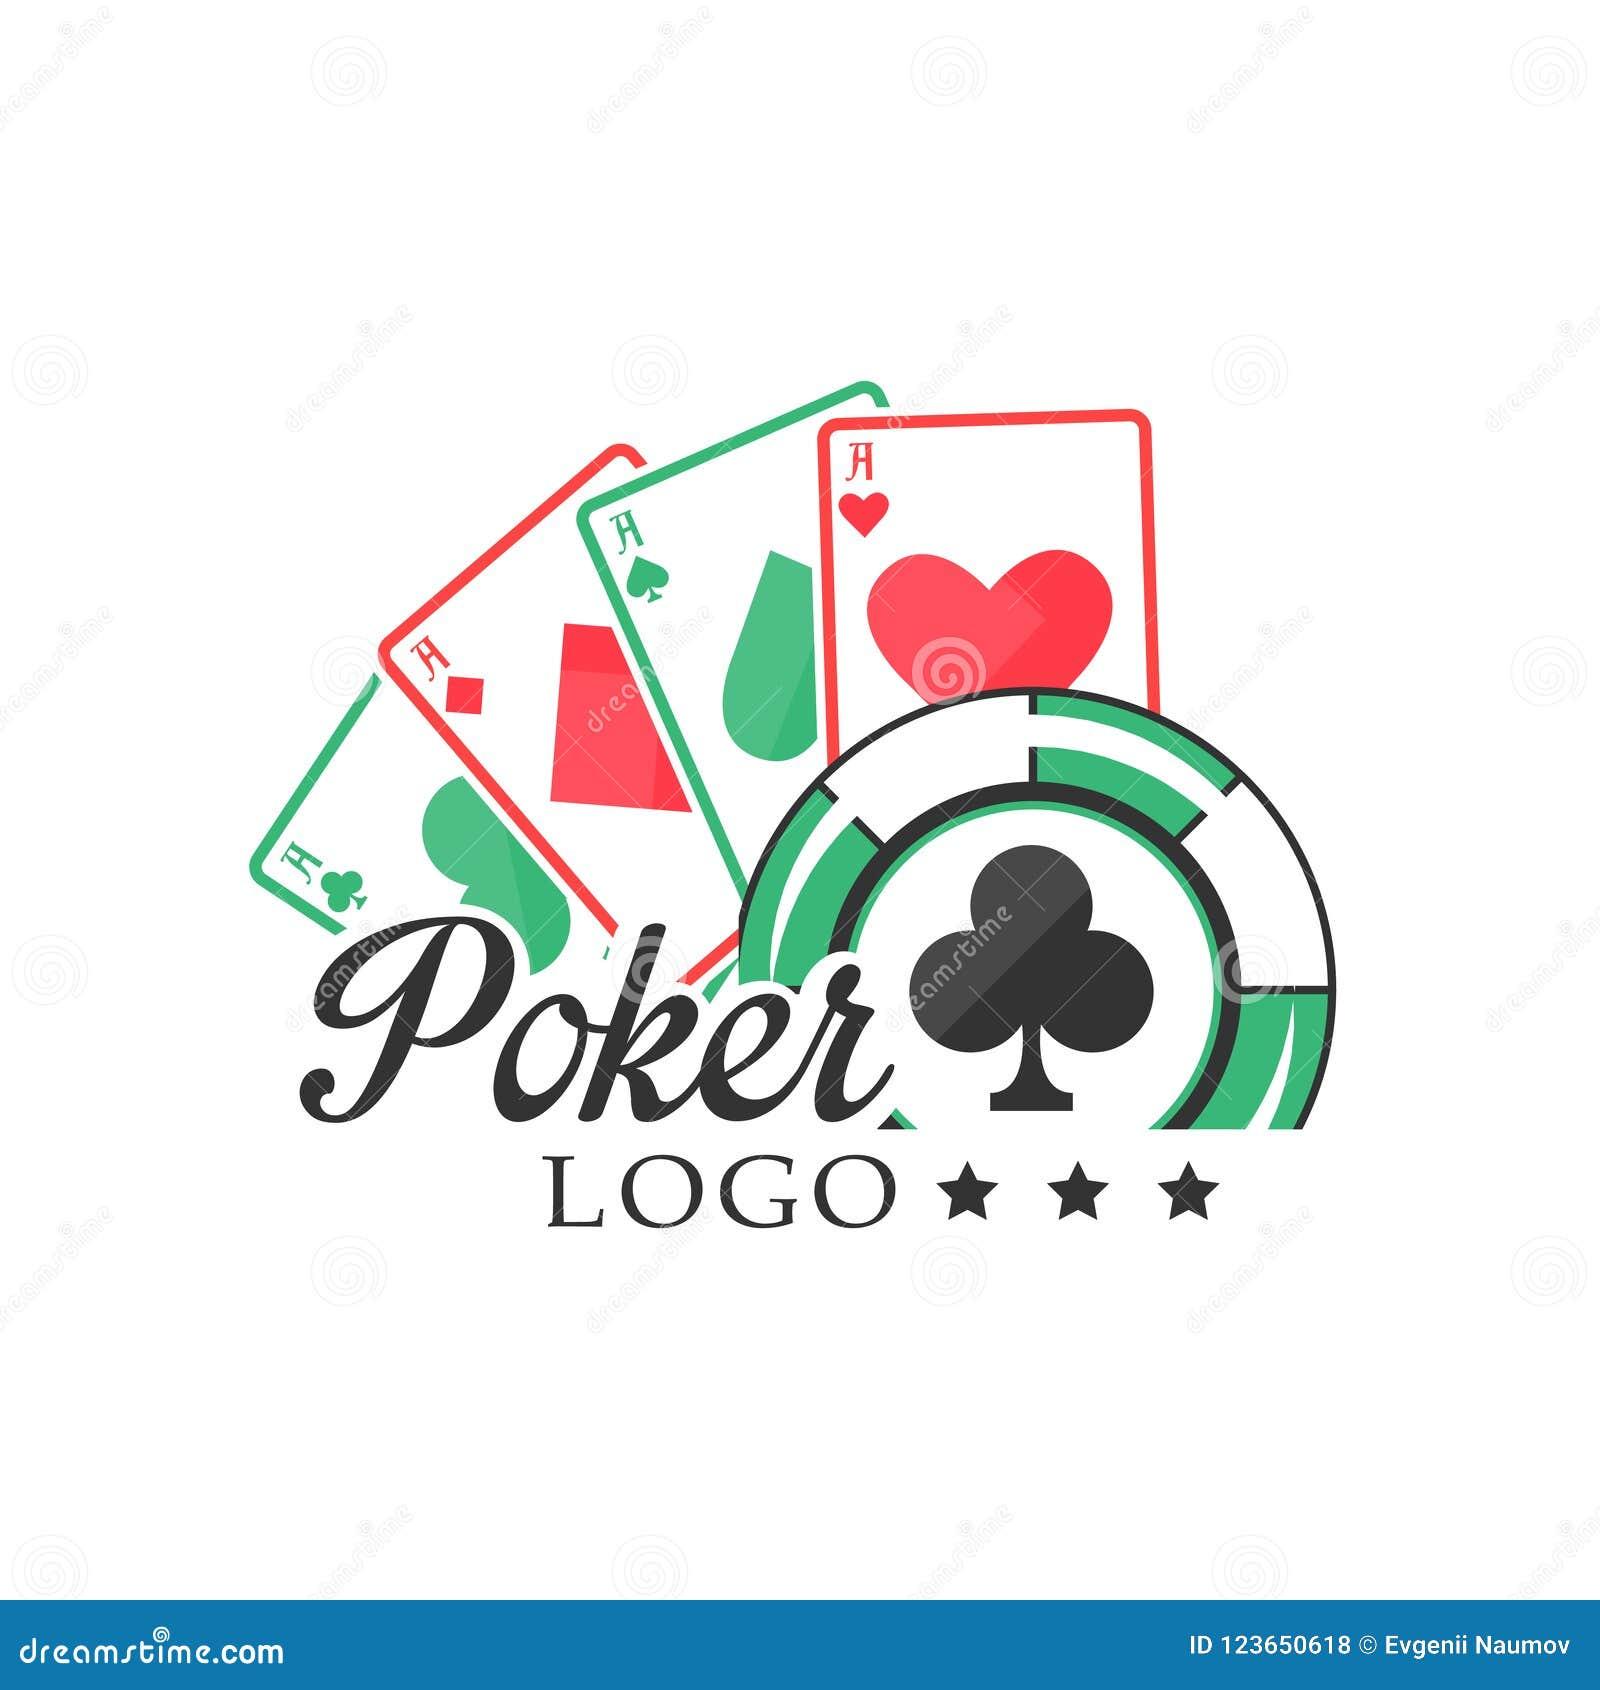 Poker Logo Vintage Emblem With Gambling Elements For Poker Club